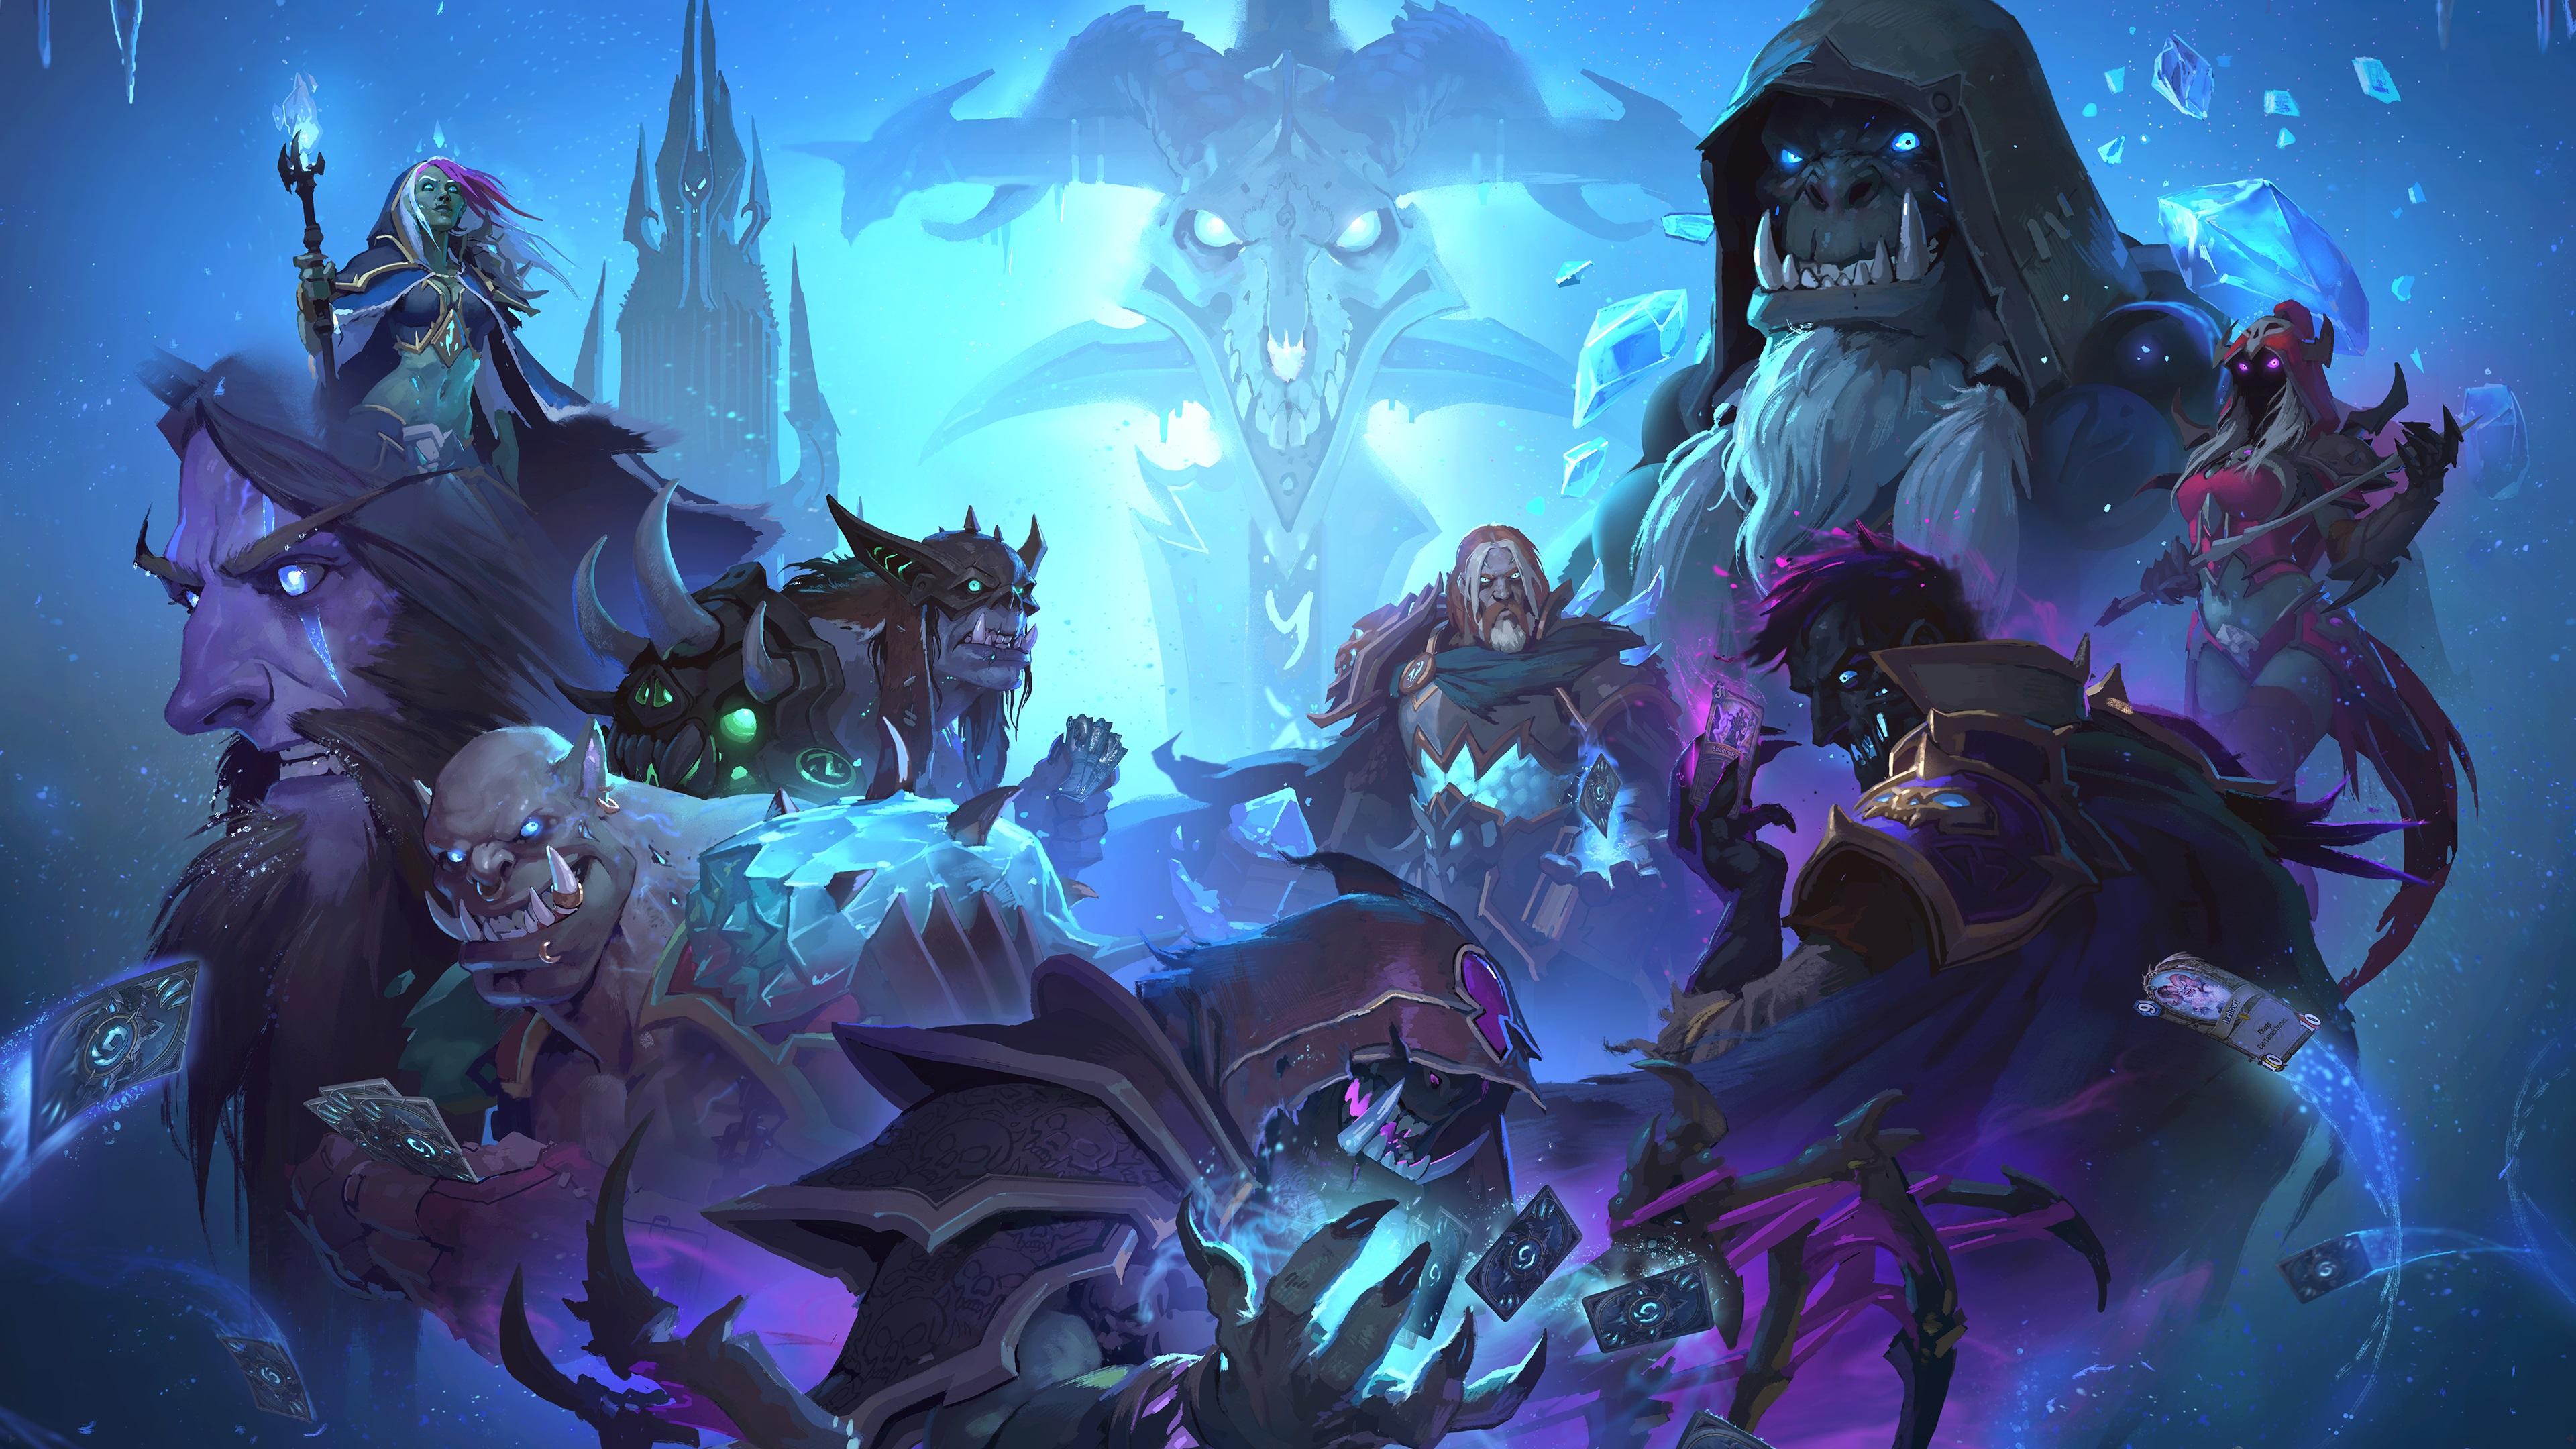 24+] Hearthstone: Heroes Of Warcraft